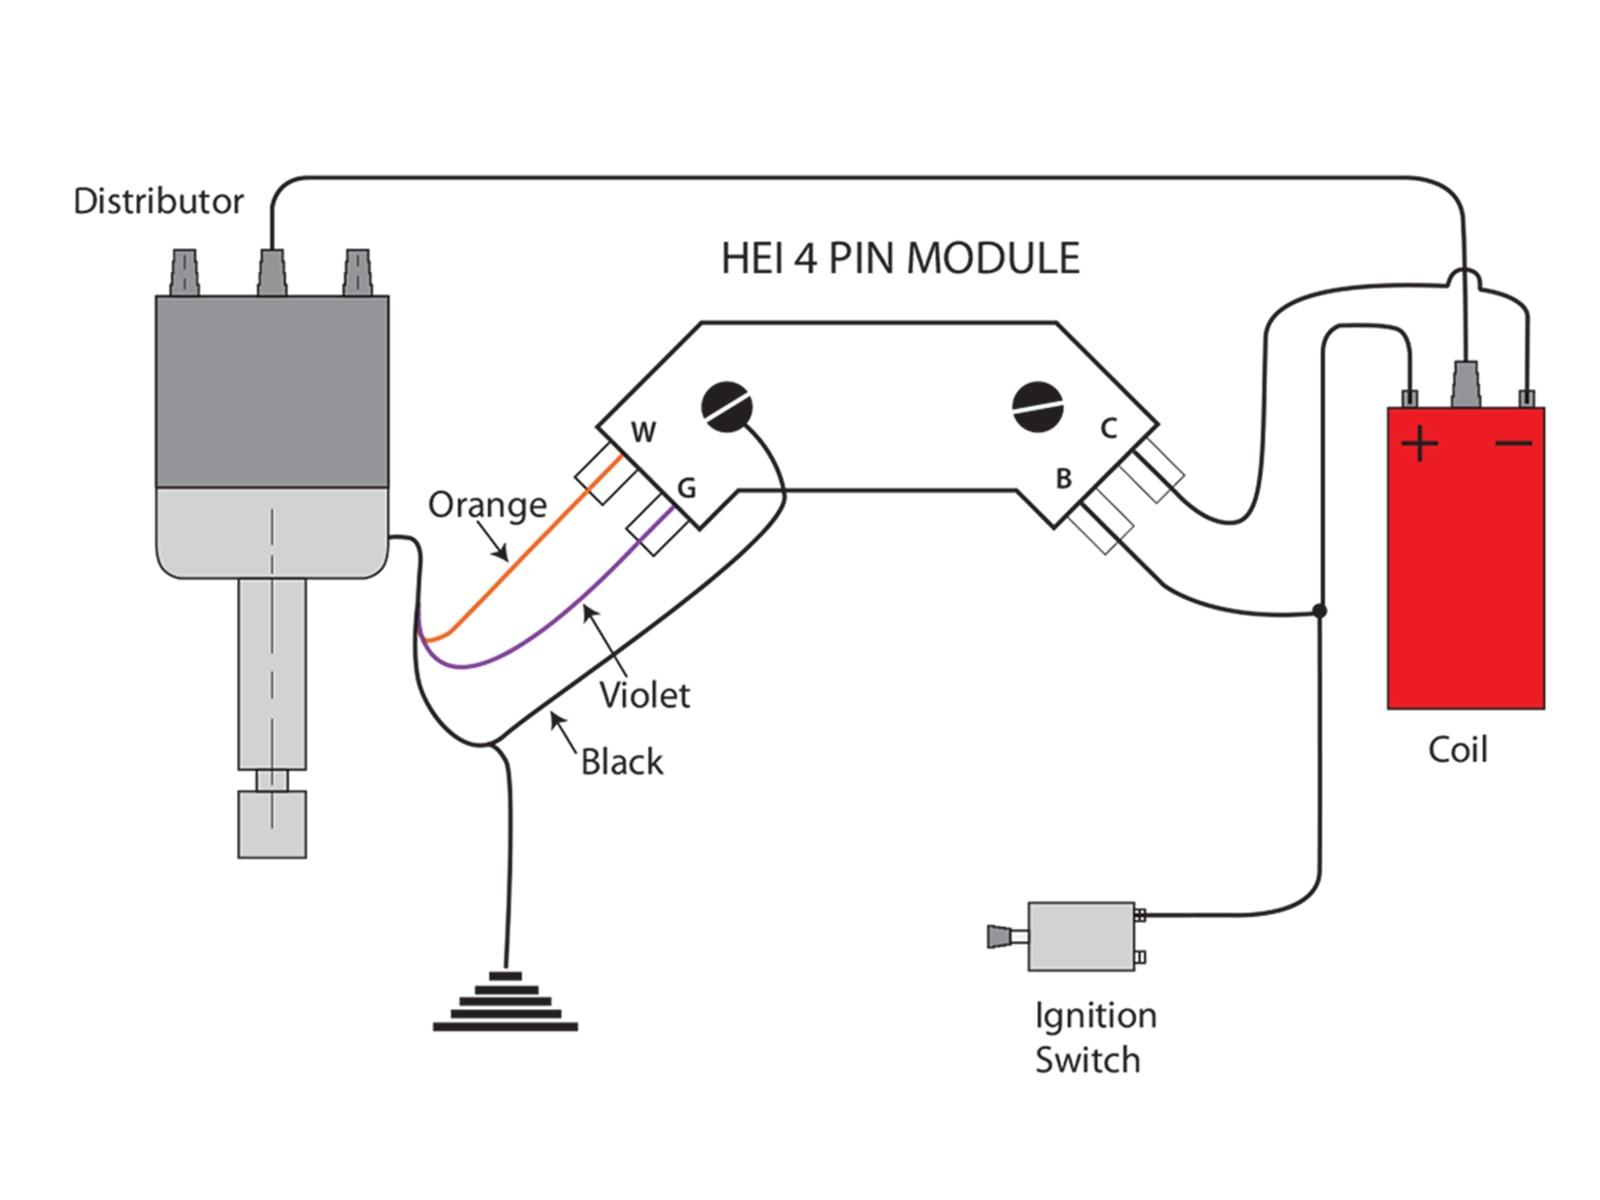 8N Ford Pertronix Ignitor Wiring Diagram | Wiring Diagram - Pertronix Ignitor Wiring Diagram